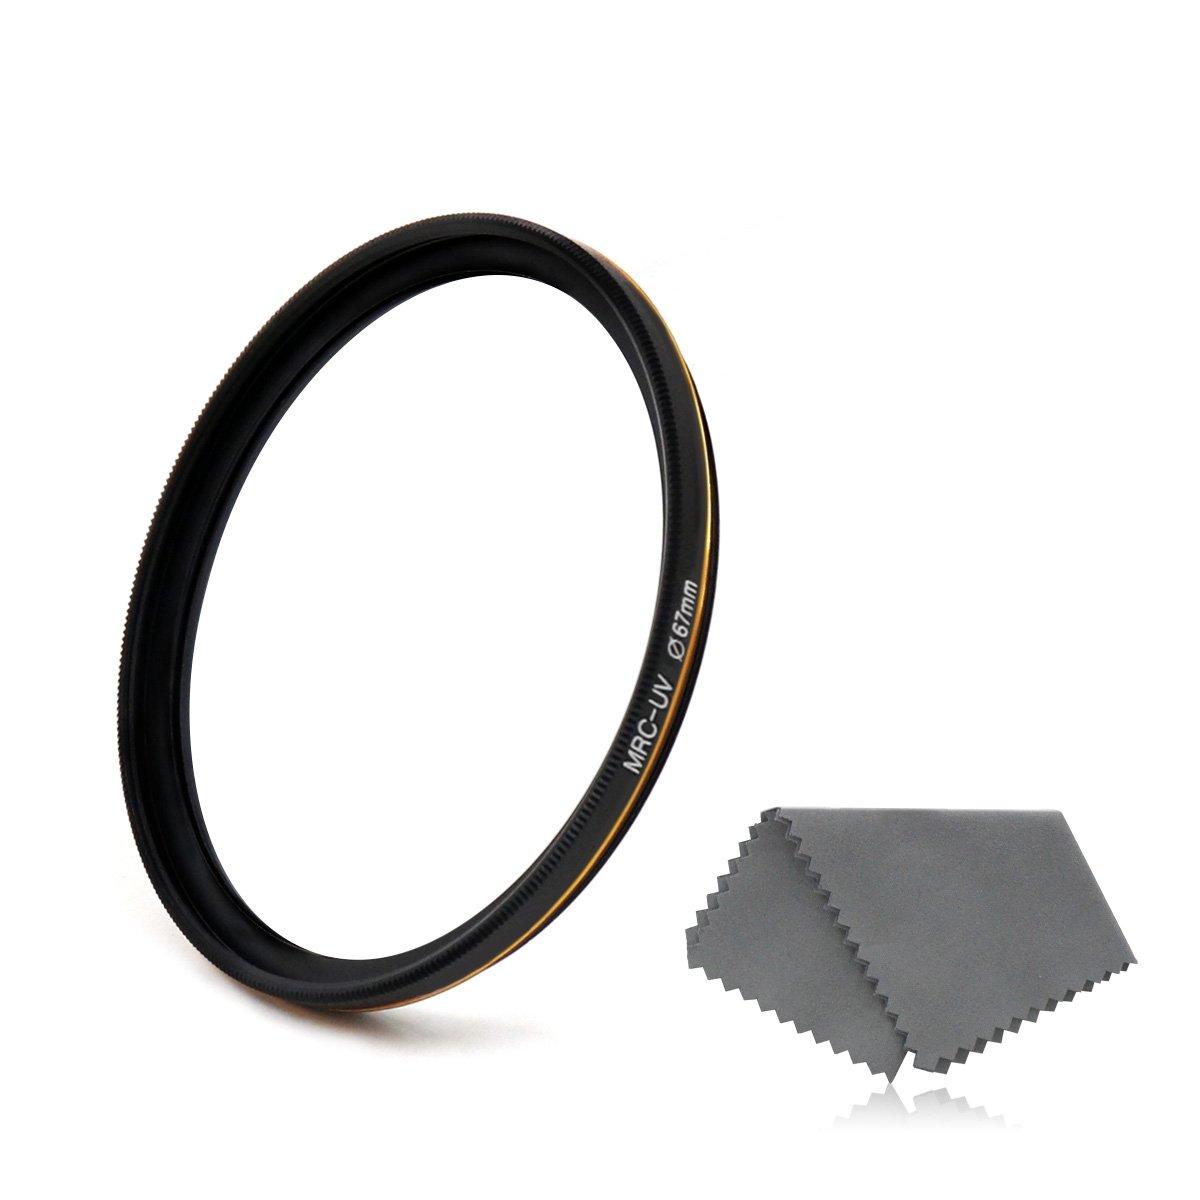 Lenskins 67mm MRC UV Protective Filter, German Optics, Weather-Sealed, 16-Layer Multi-Resistant Nano Coated HD Clear Glass Ultra Violet Filter, Ultra Slim Camera Lens Protector with Lens Cloth by LENSKINS